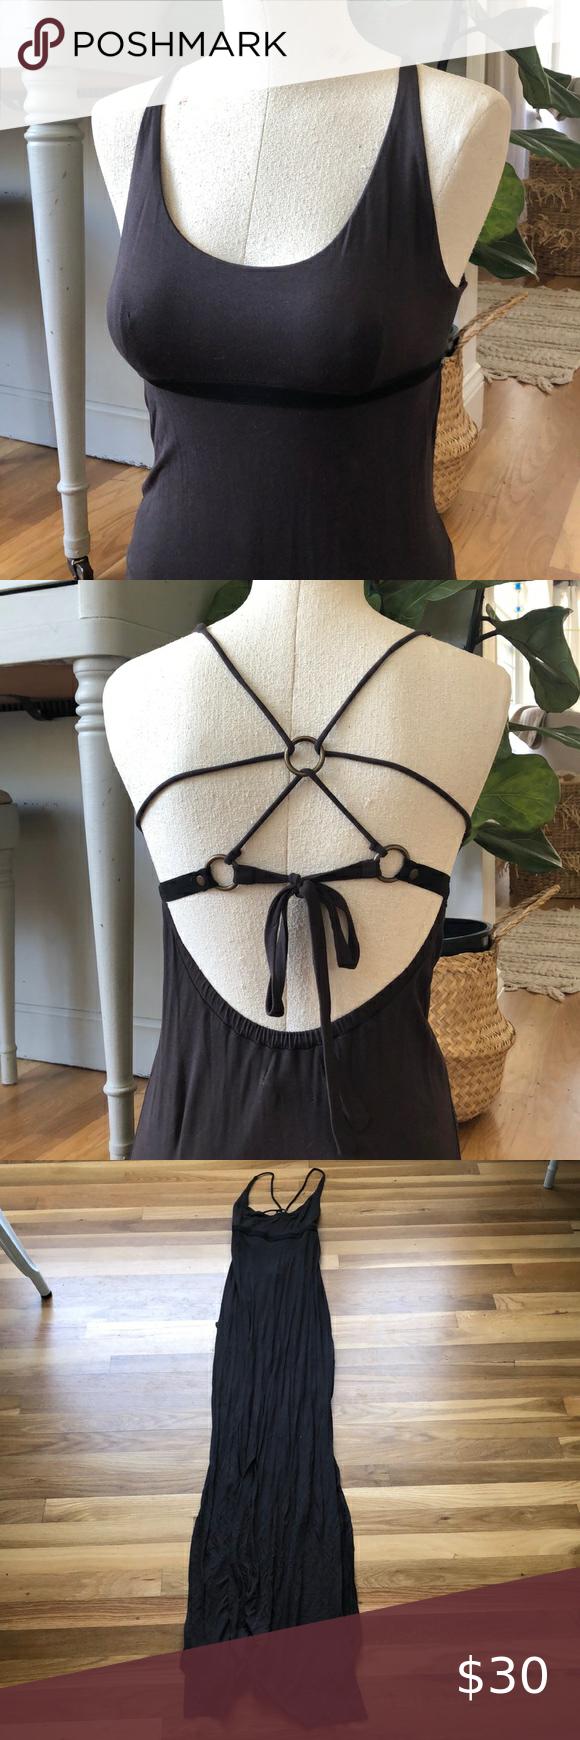 Brownish Gray Tank Top Maxi Dress In 2021 Top Maxi Dresses Maxi Dress Cotton Maxi Dress [ 1740 x 580 Pixel ]